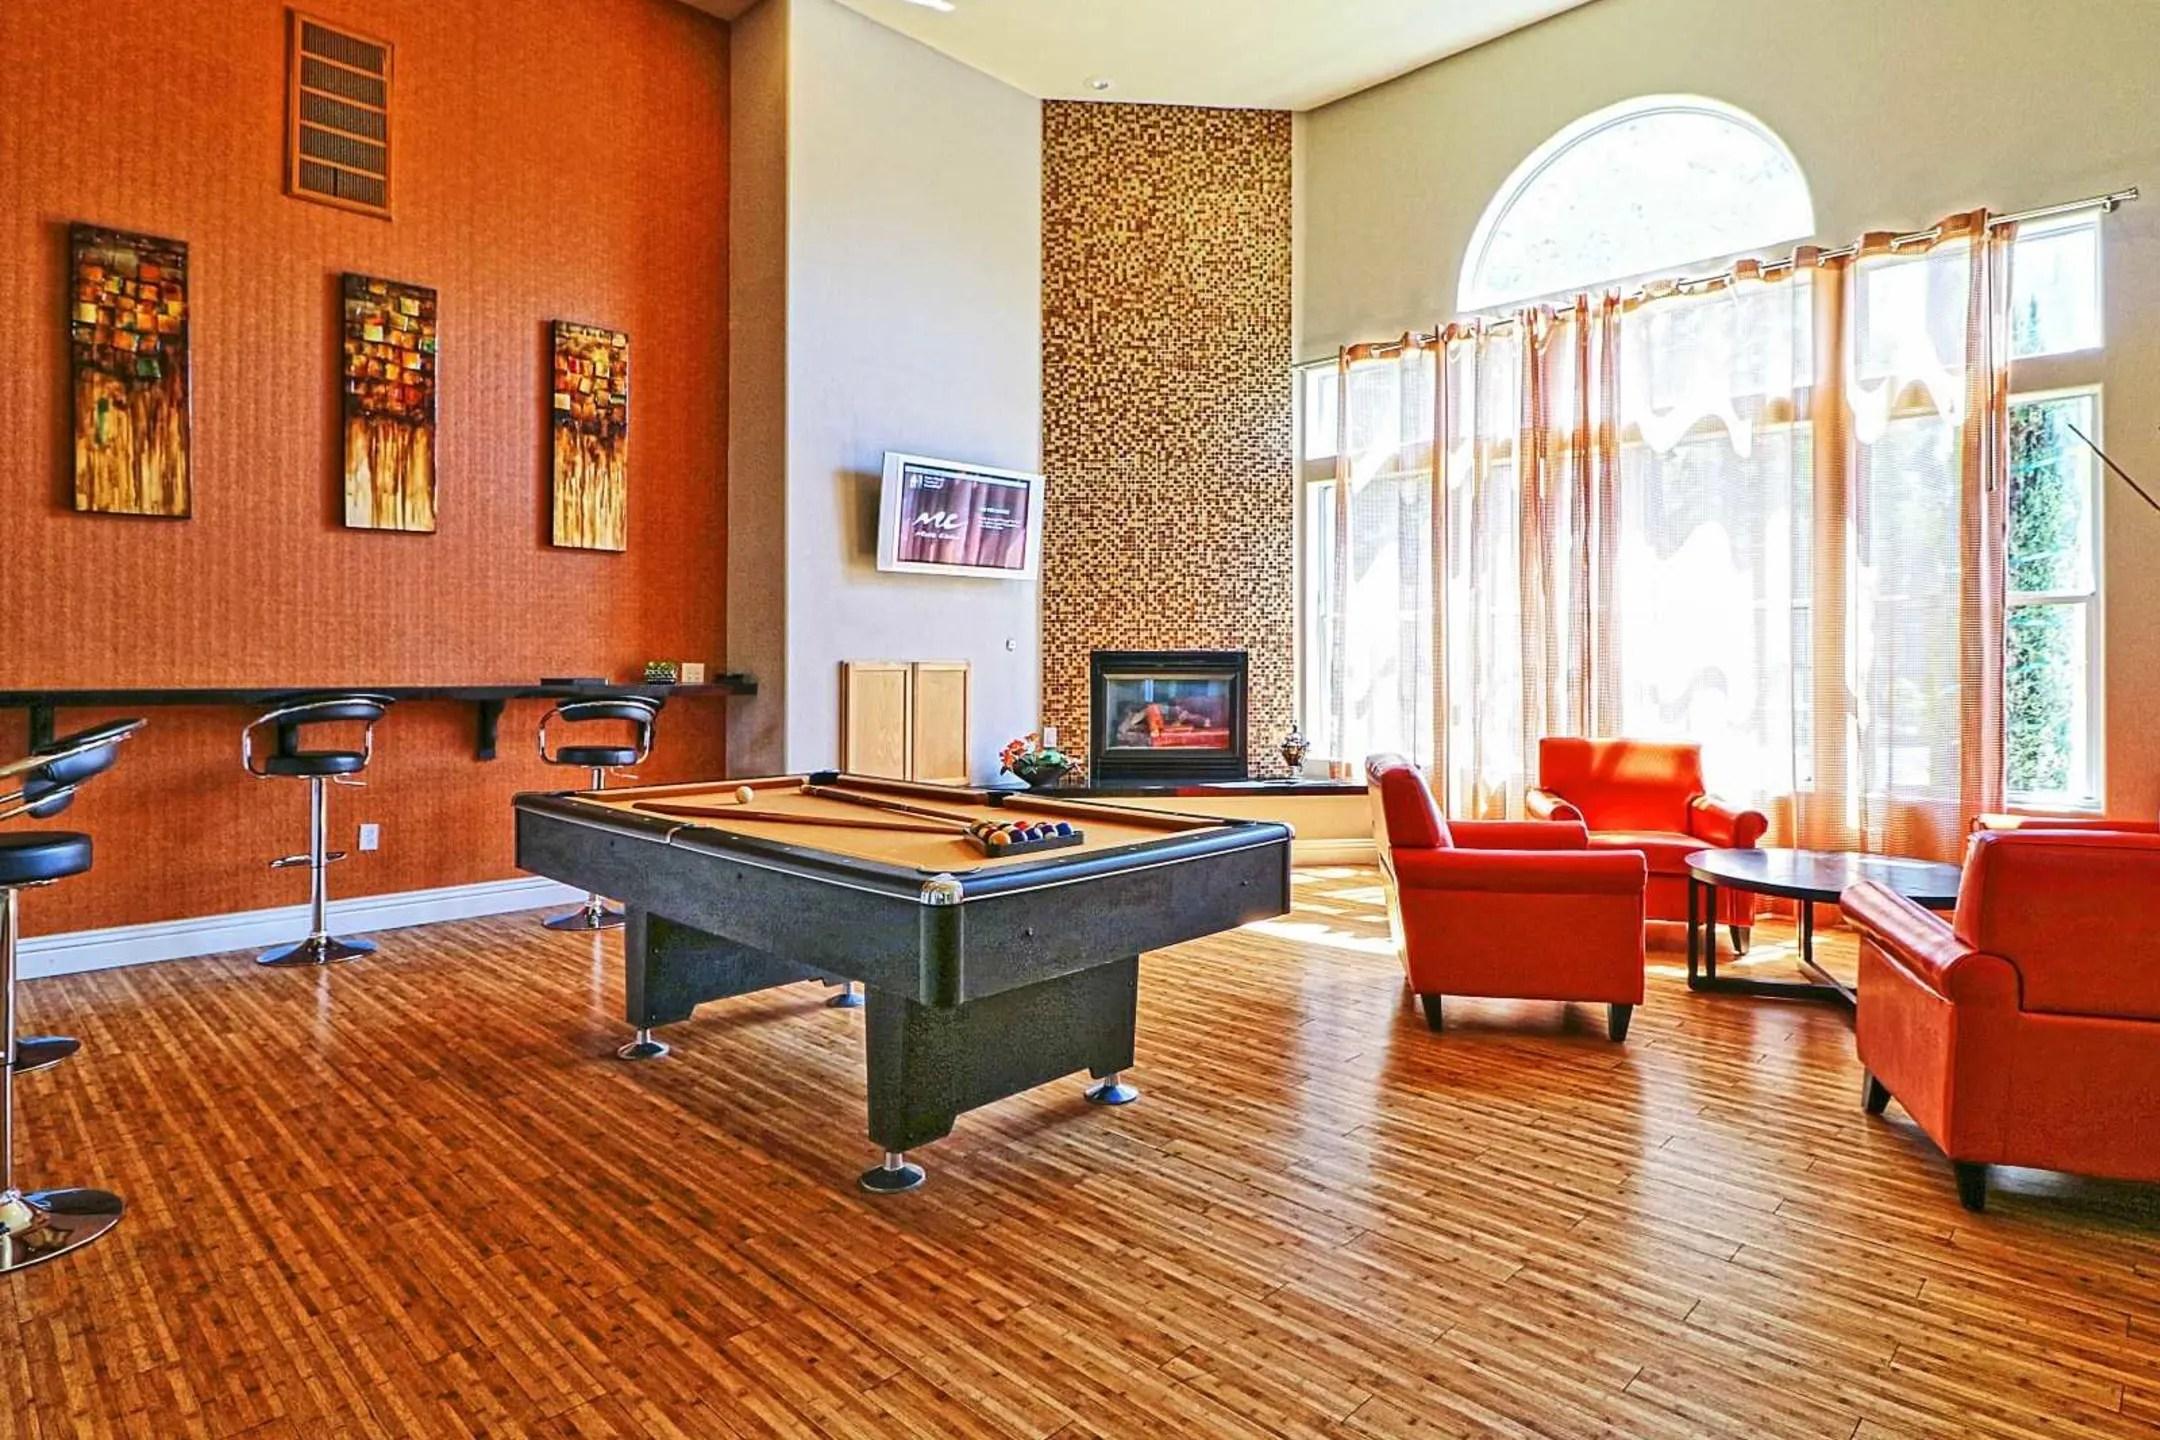 Guide Vegas Apartment Las 89131